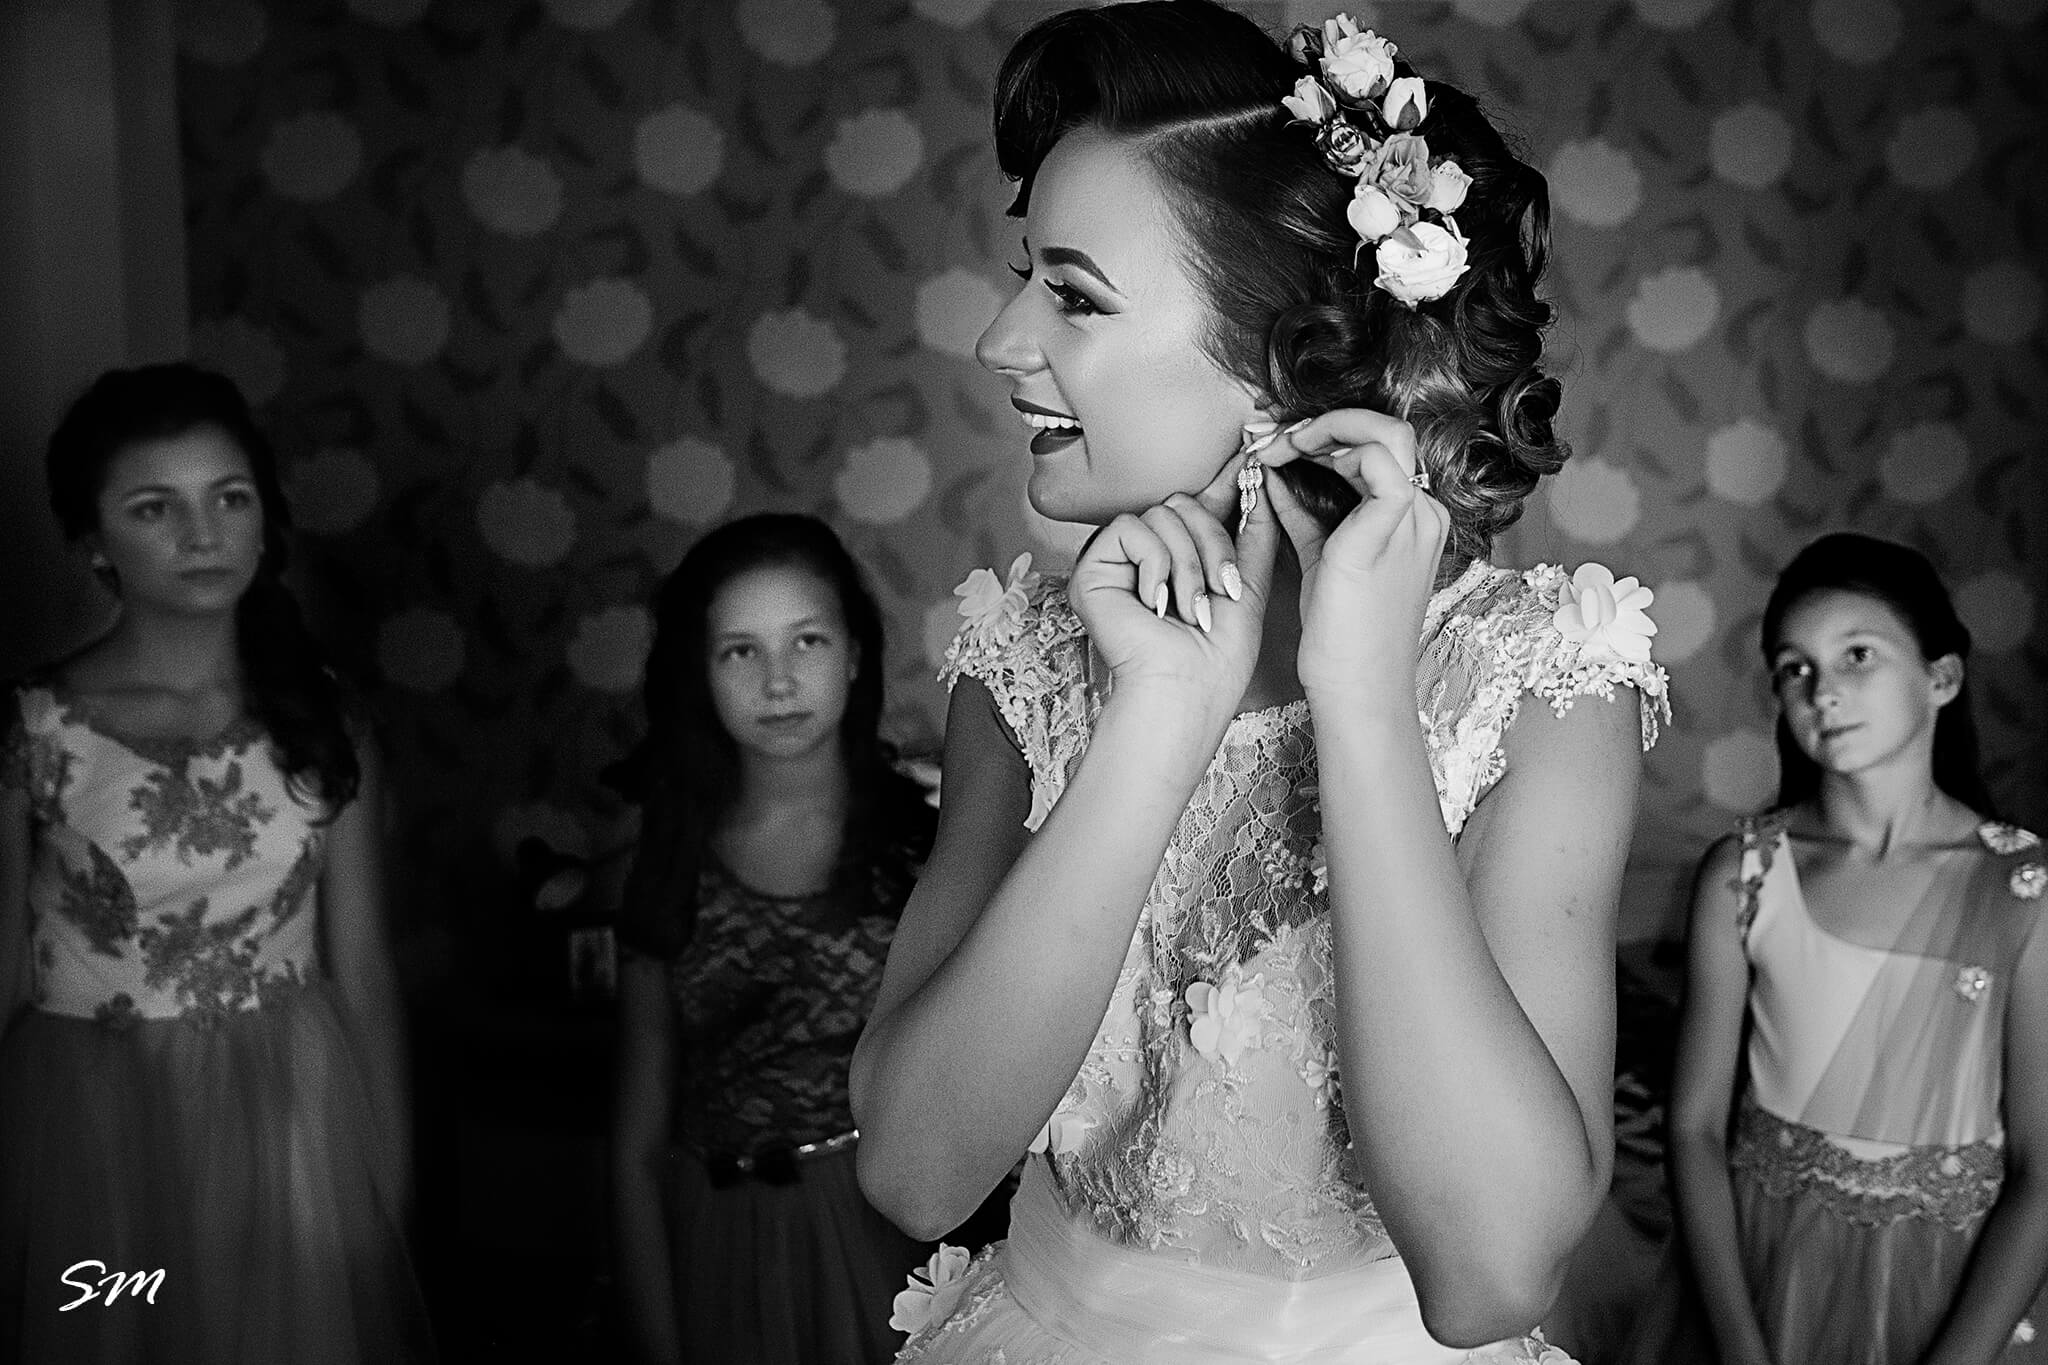 fotograf_nunta_profesionist_suceava (8)